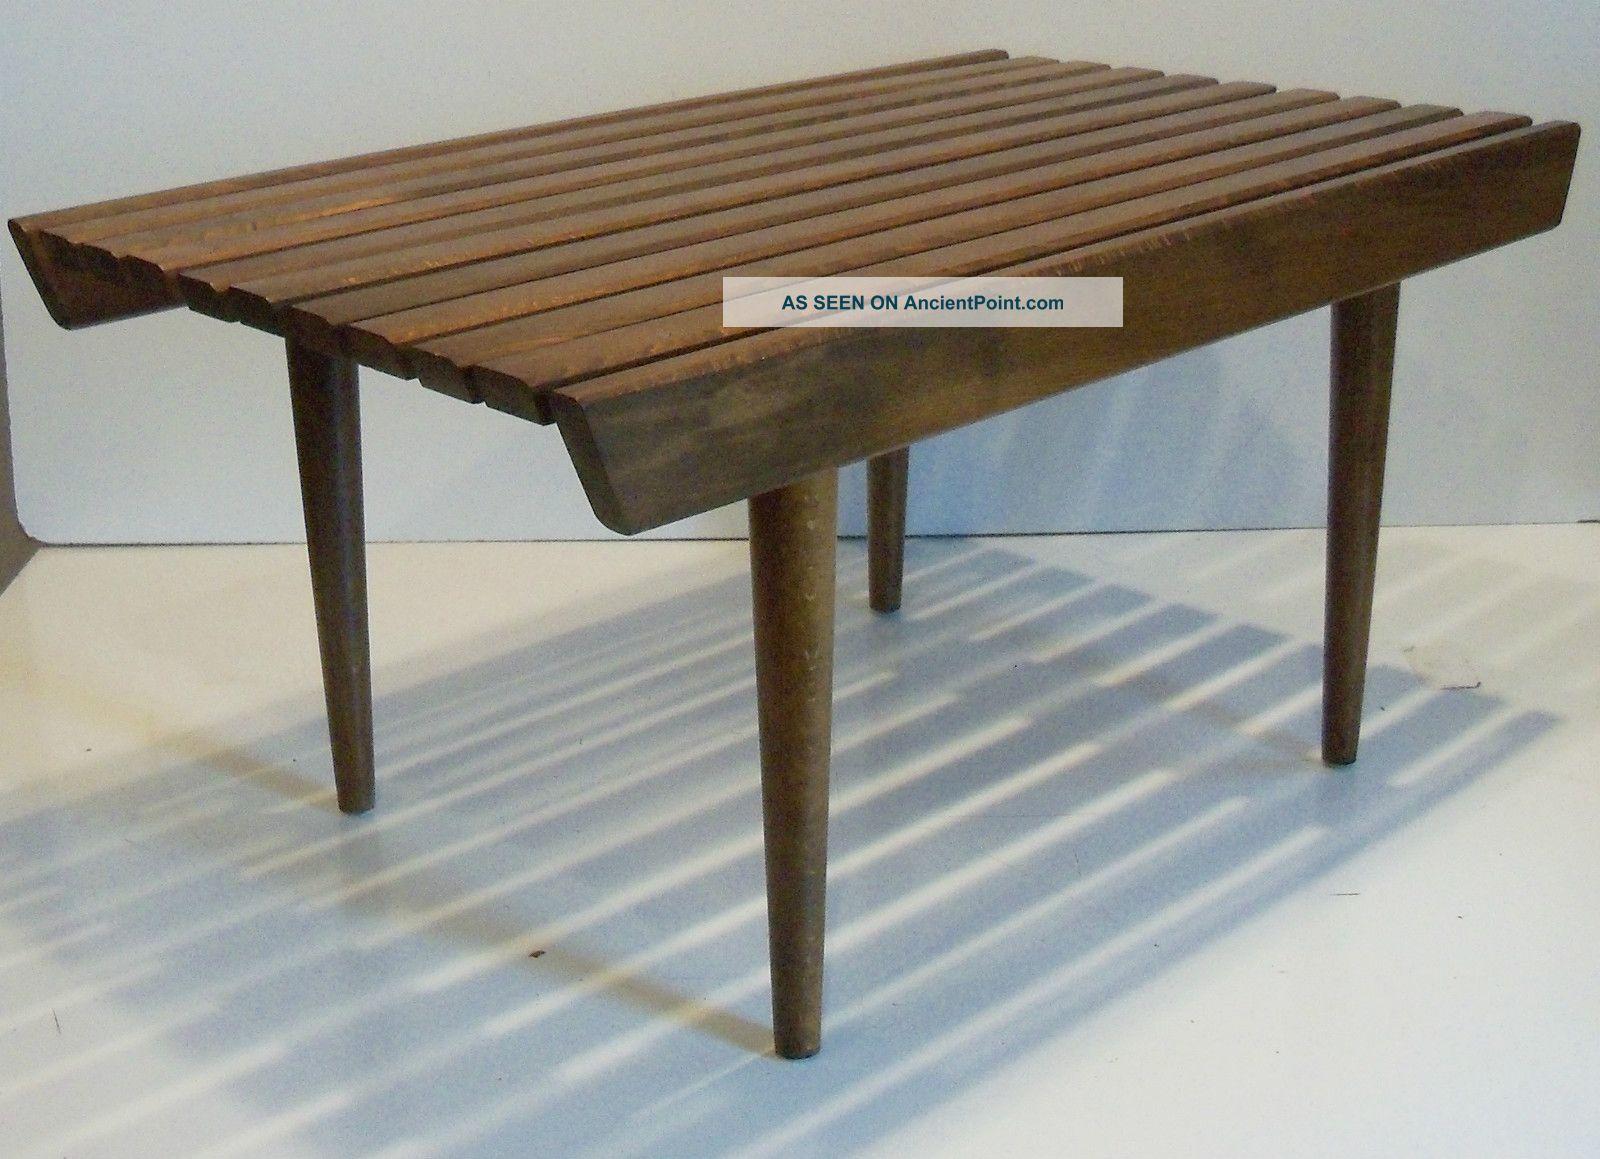 Vintage Eames Era Mid Century Danish Modern Wooden Slat